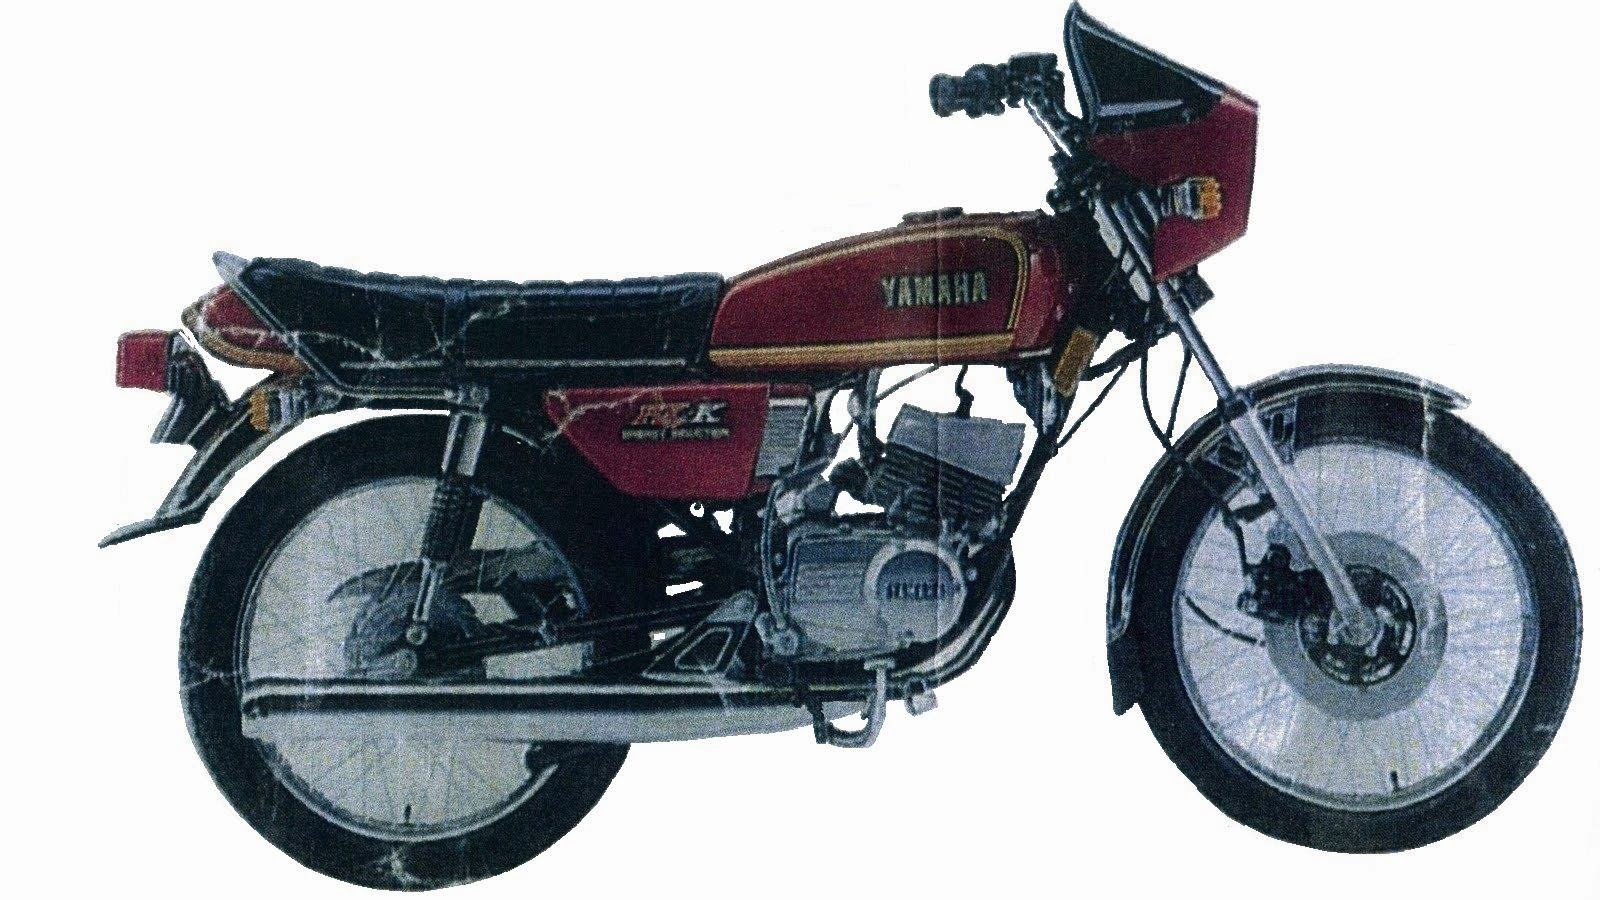 Harga Tembus Rp 70 Jutaan Apa Spesialnya Yamaha Rx King Cobra